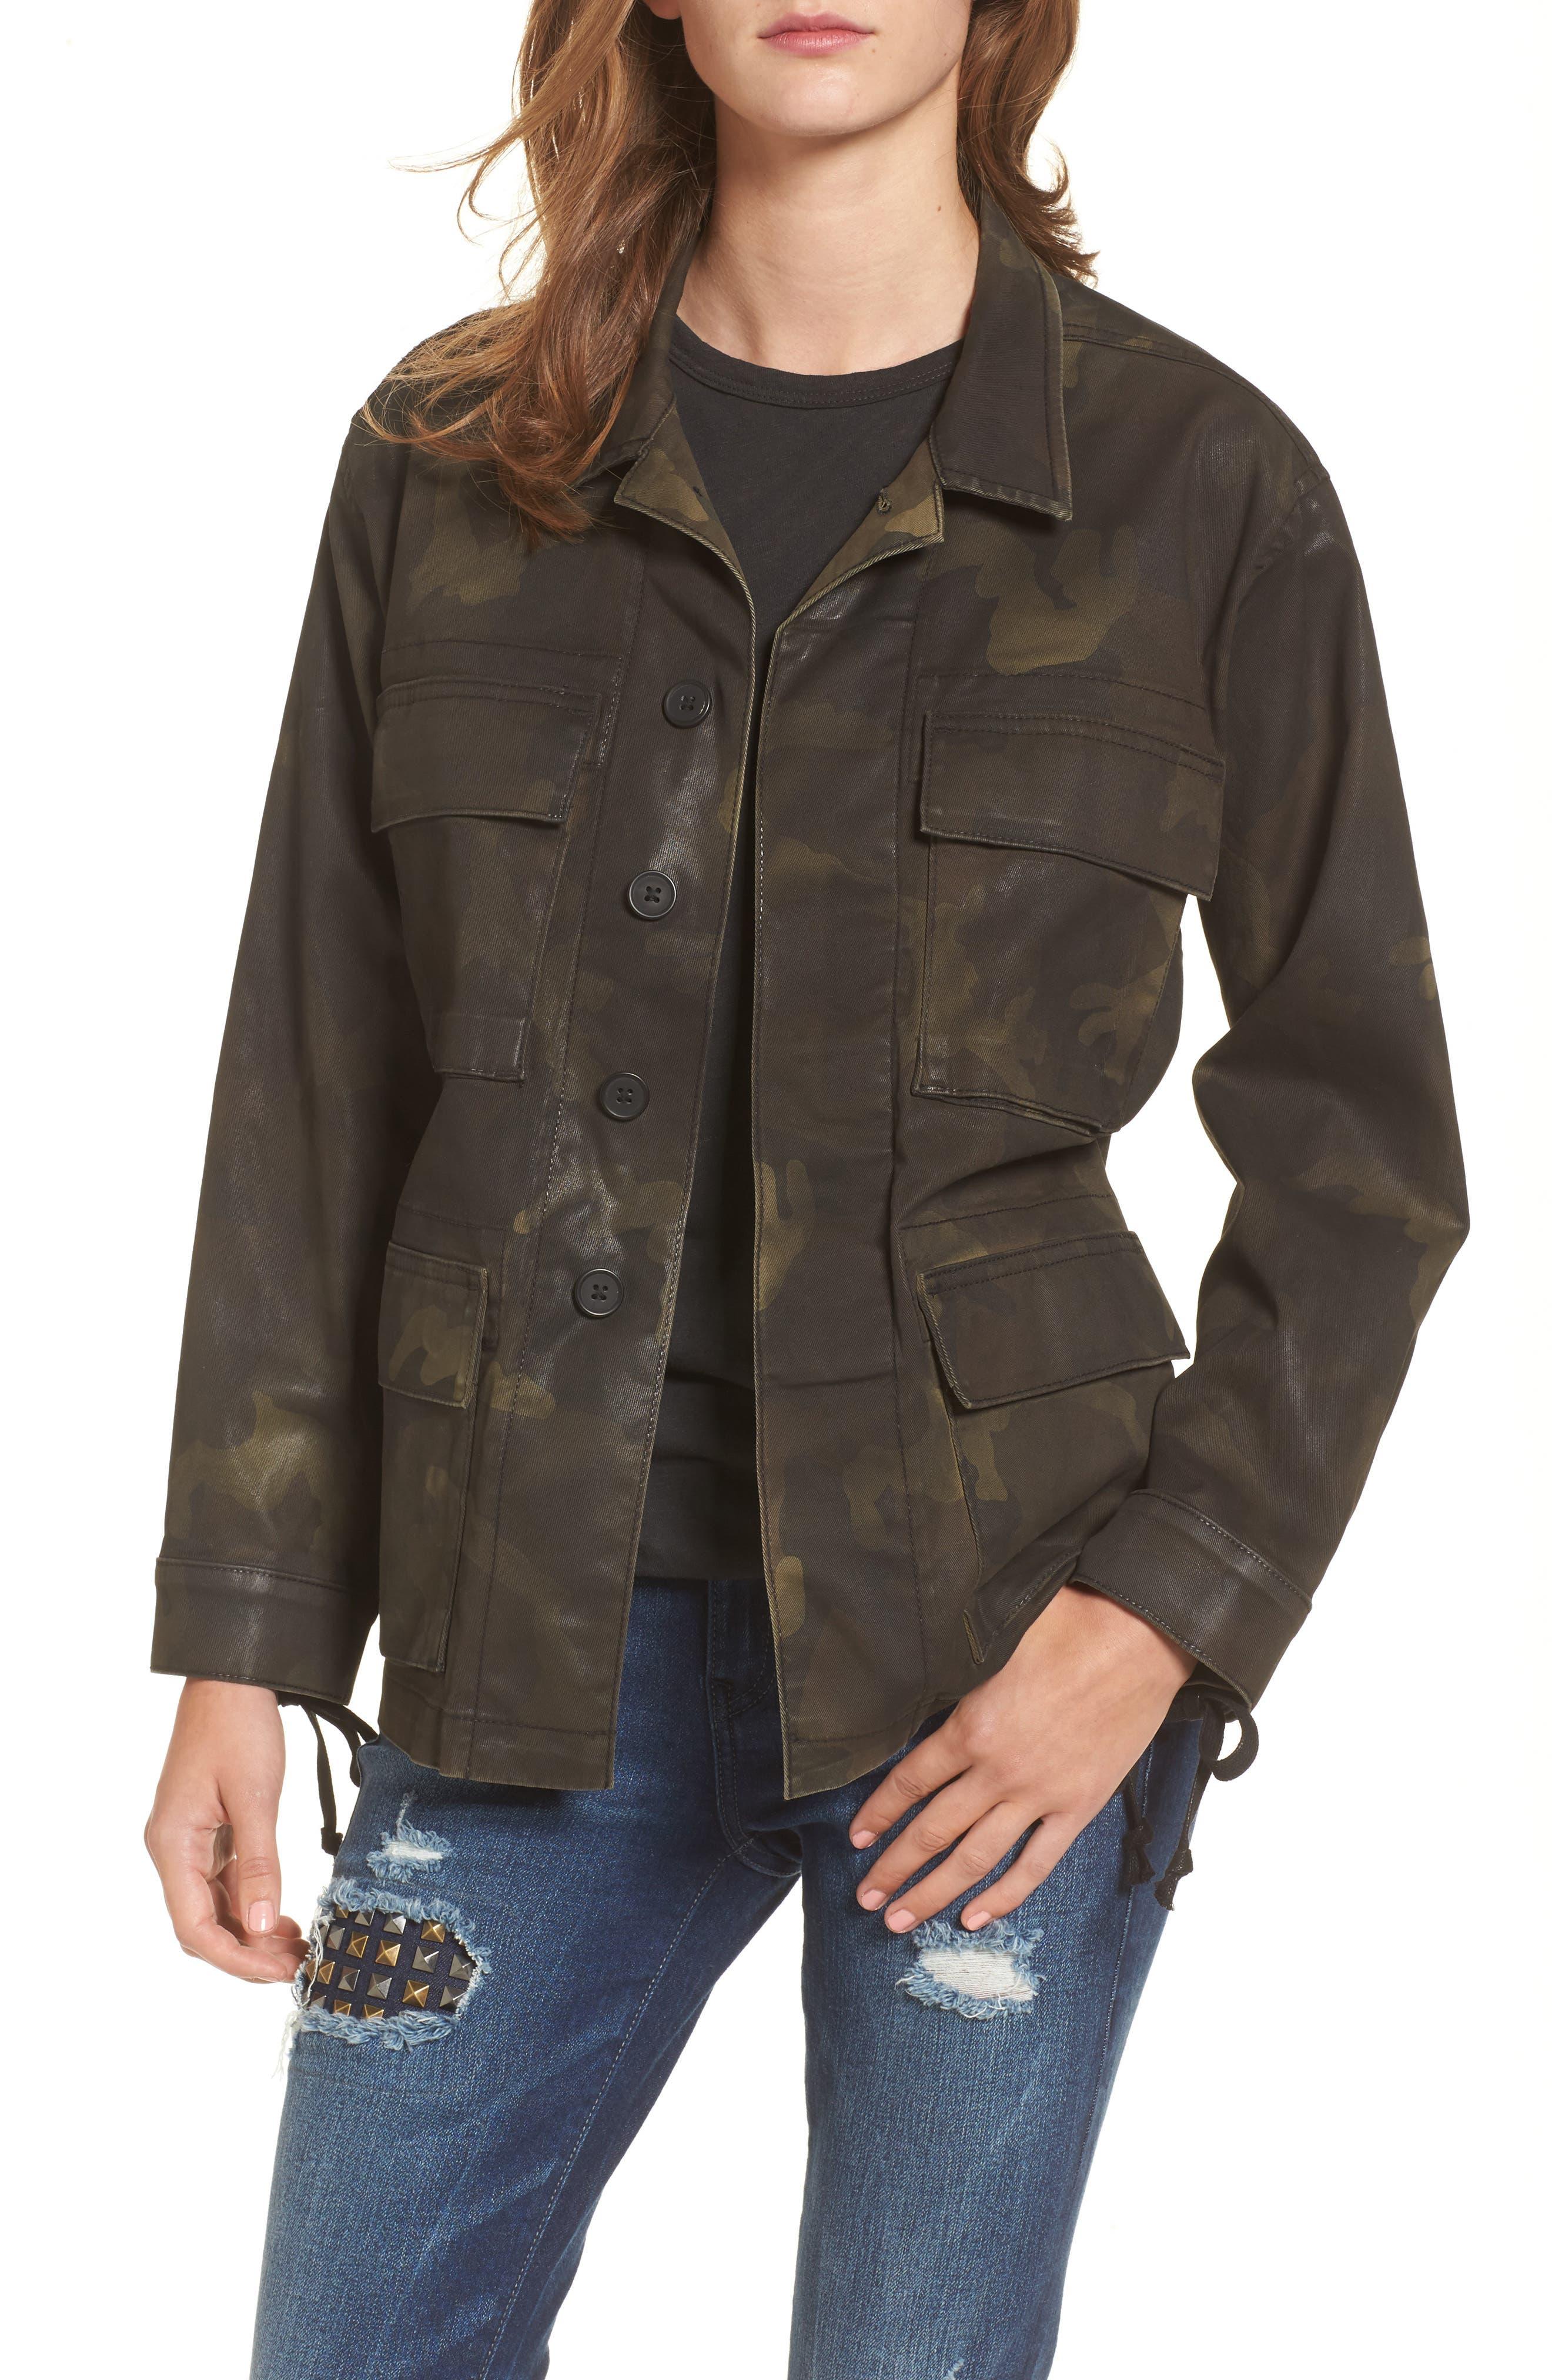 Main Image - True Religion Brand Jeans Coated Military Jacket